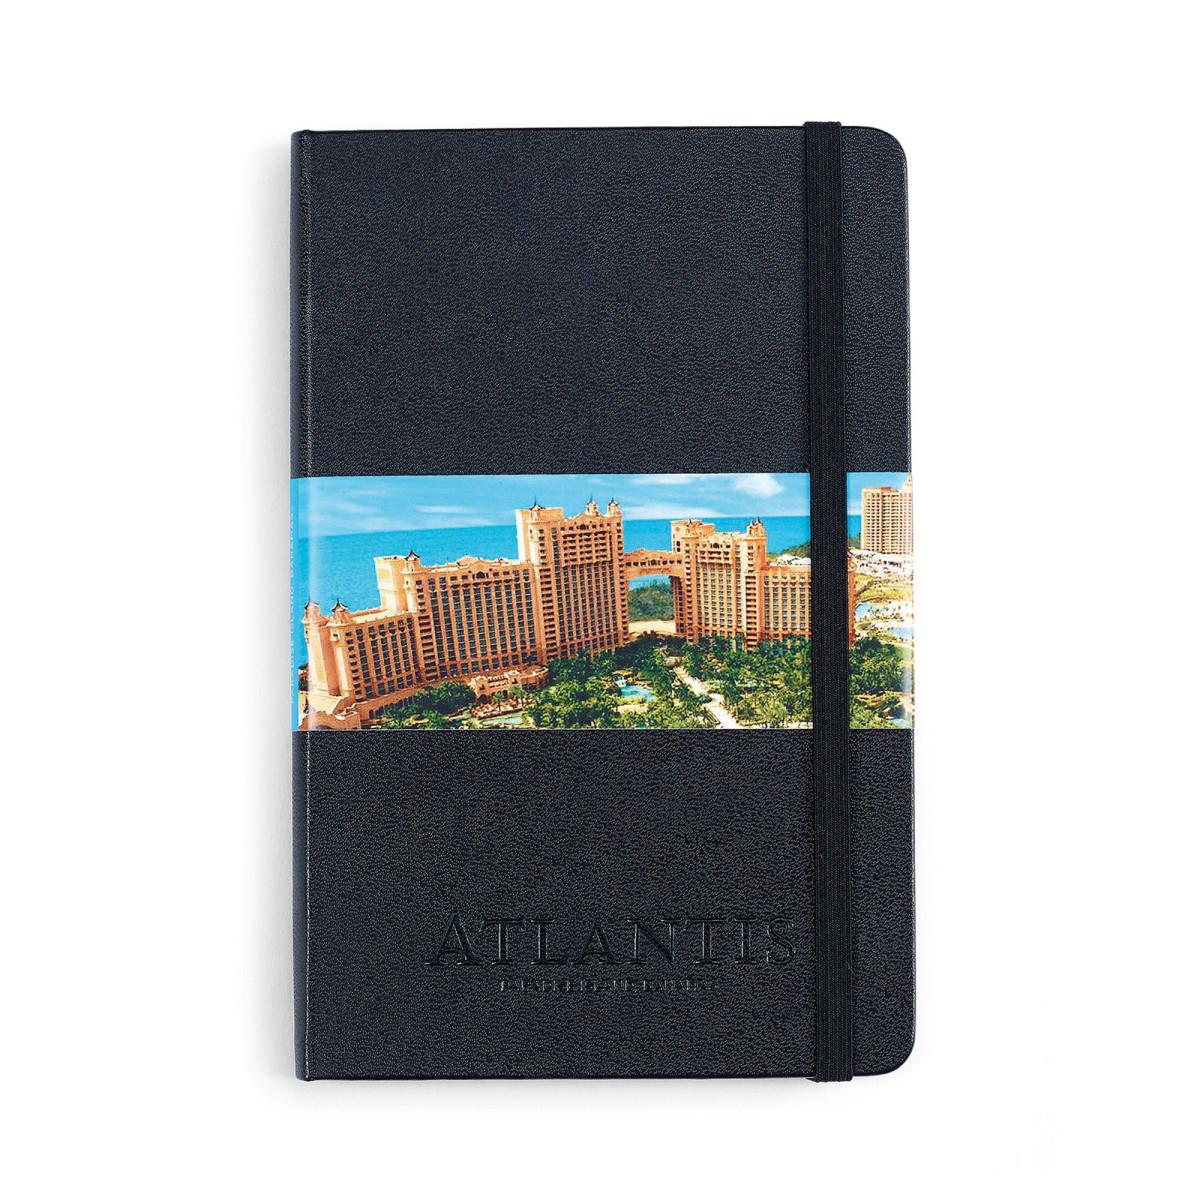 Moleskine® Hard Cover Ruled Medium Notebook Black